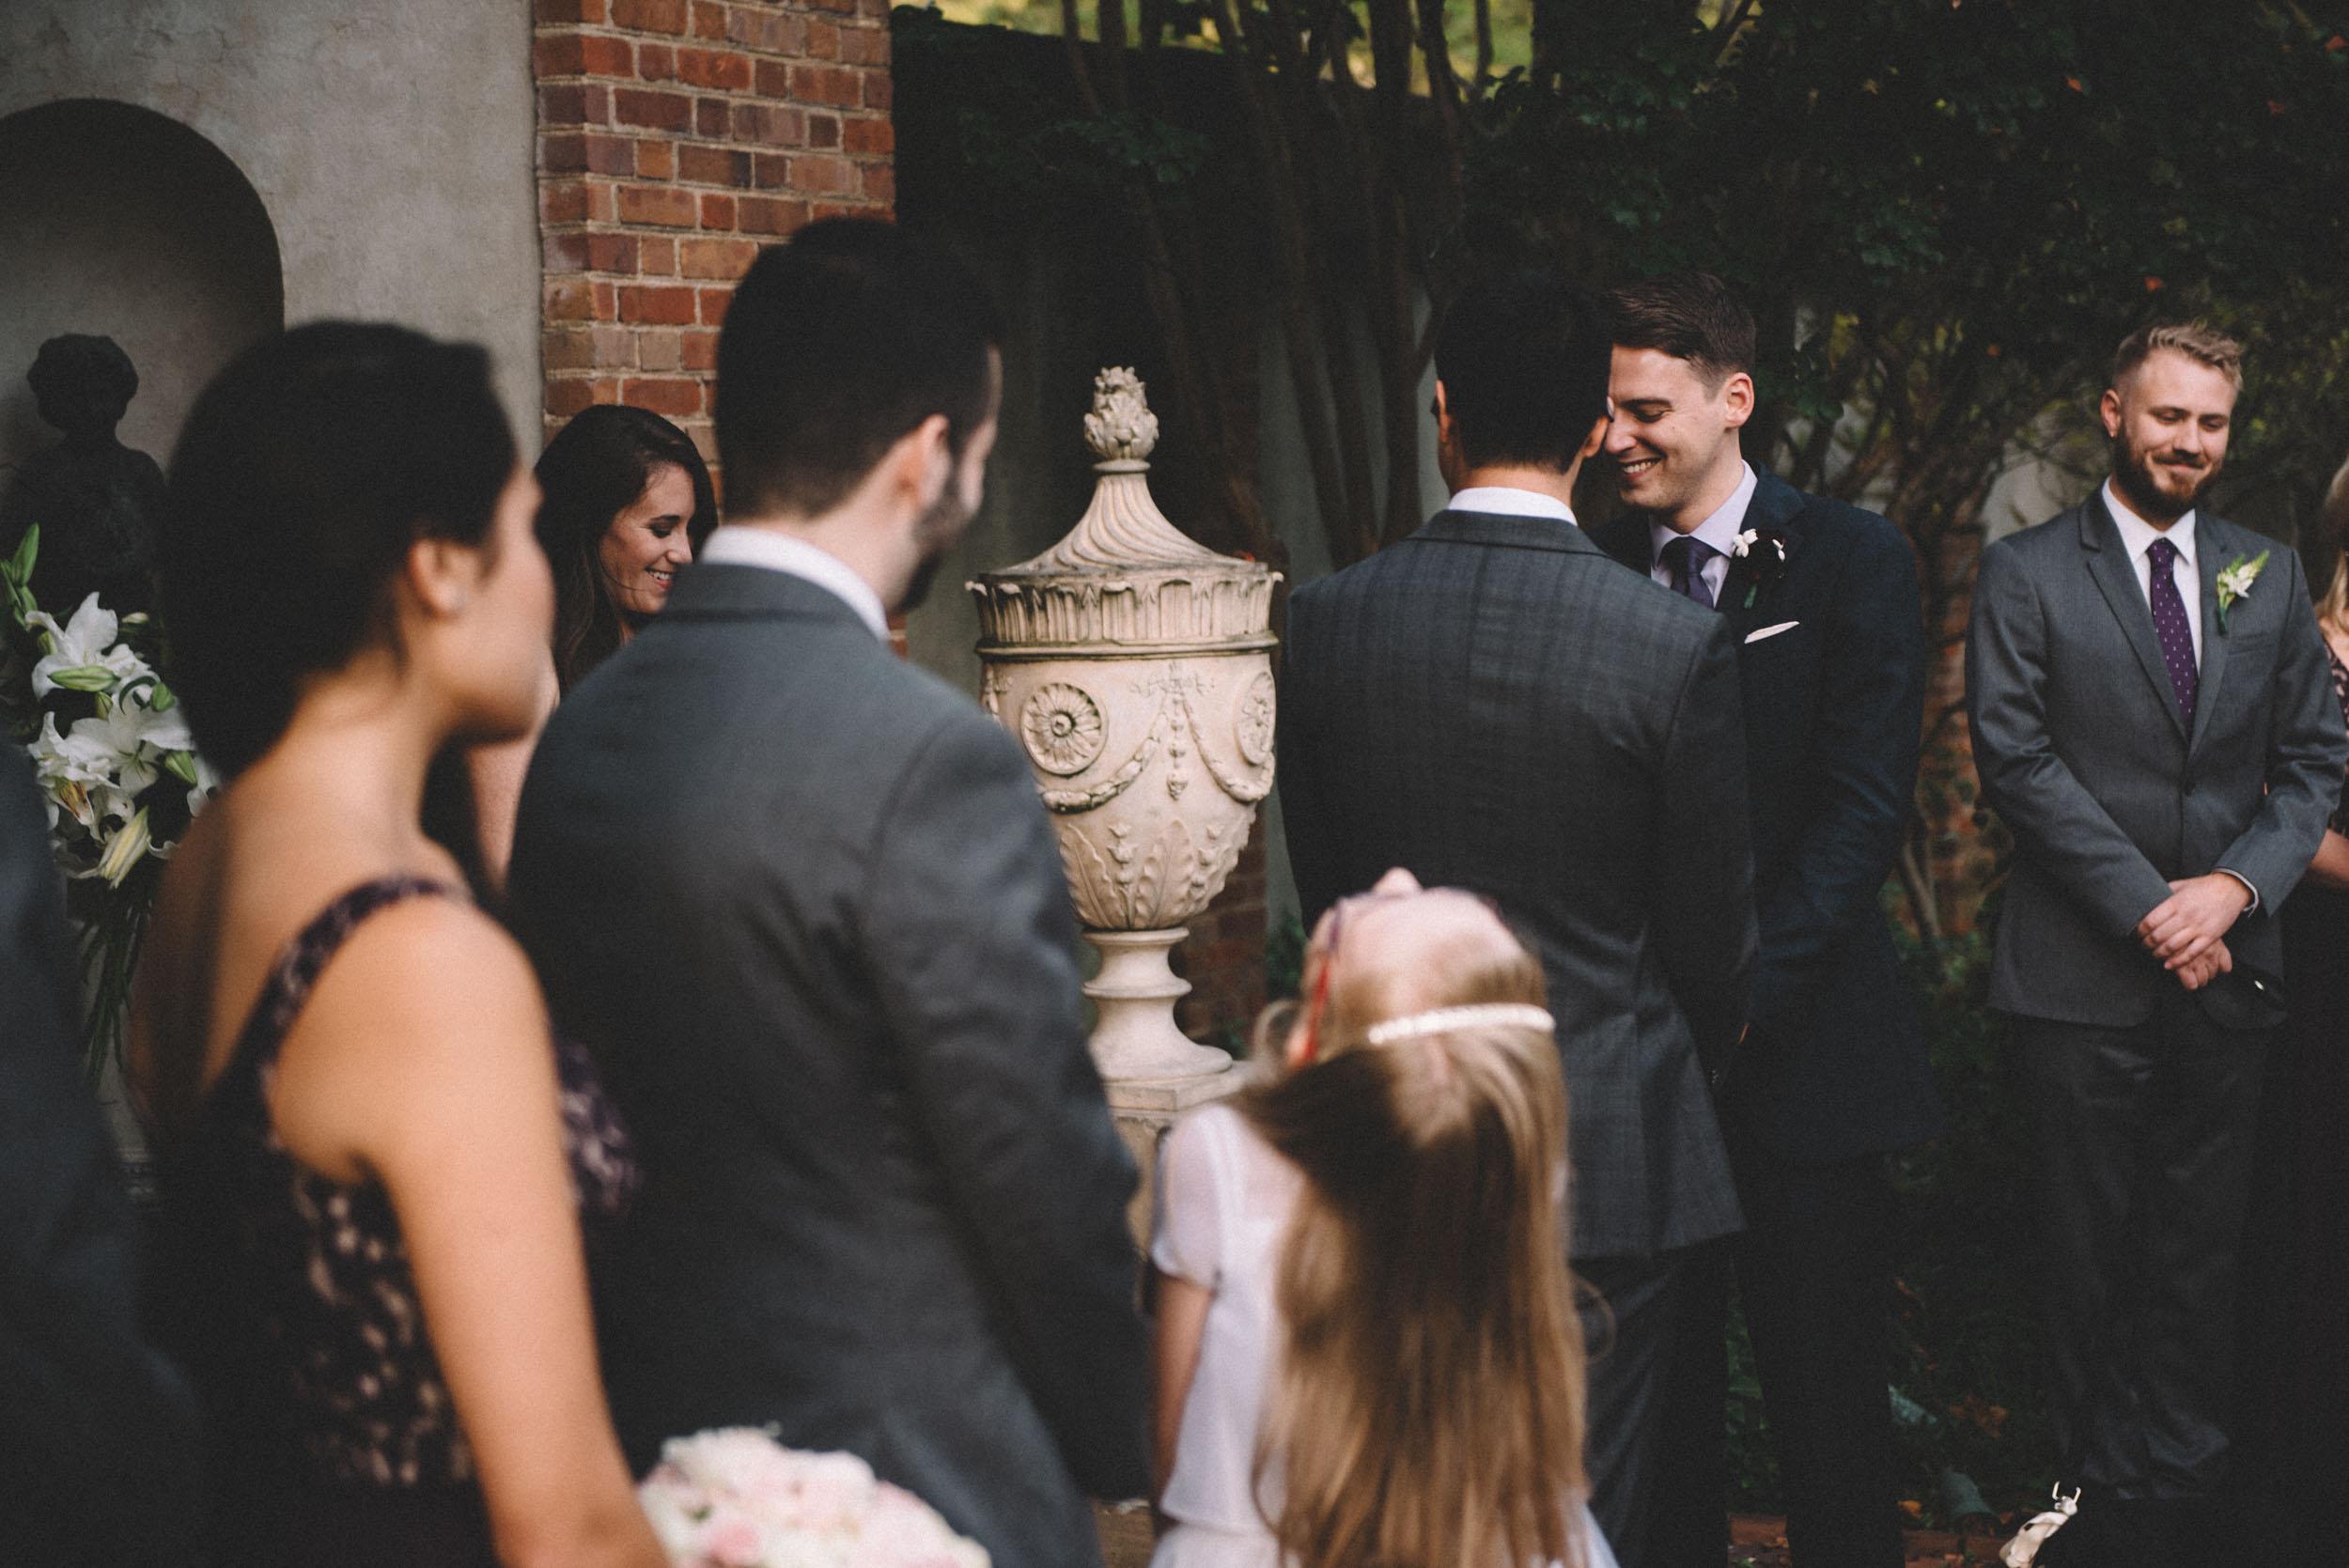 Dumbarton-House-wedding-44.jpg